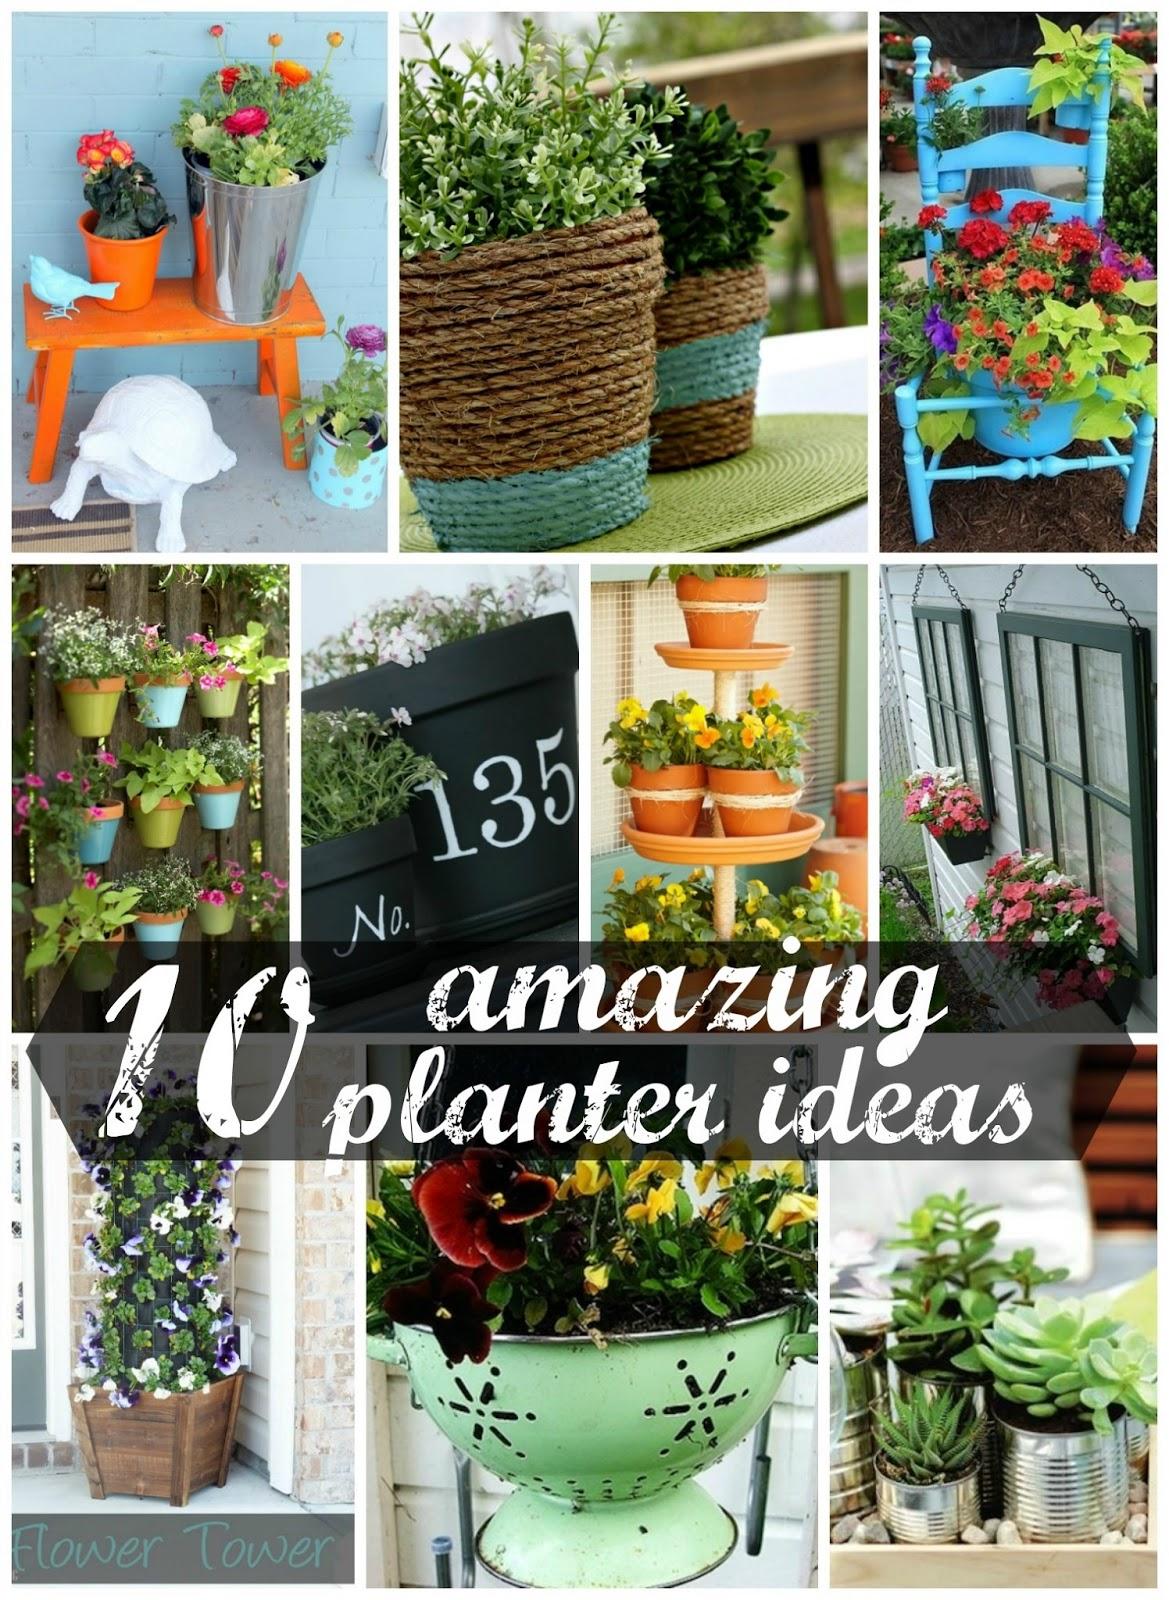 10 amazing planter ideas for Yard planter ideas